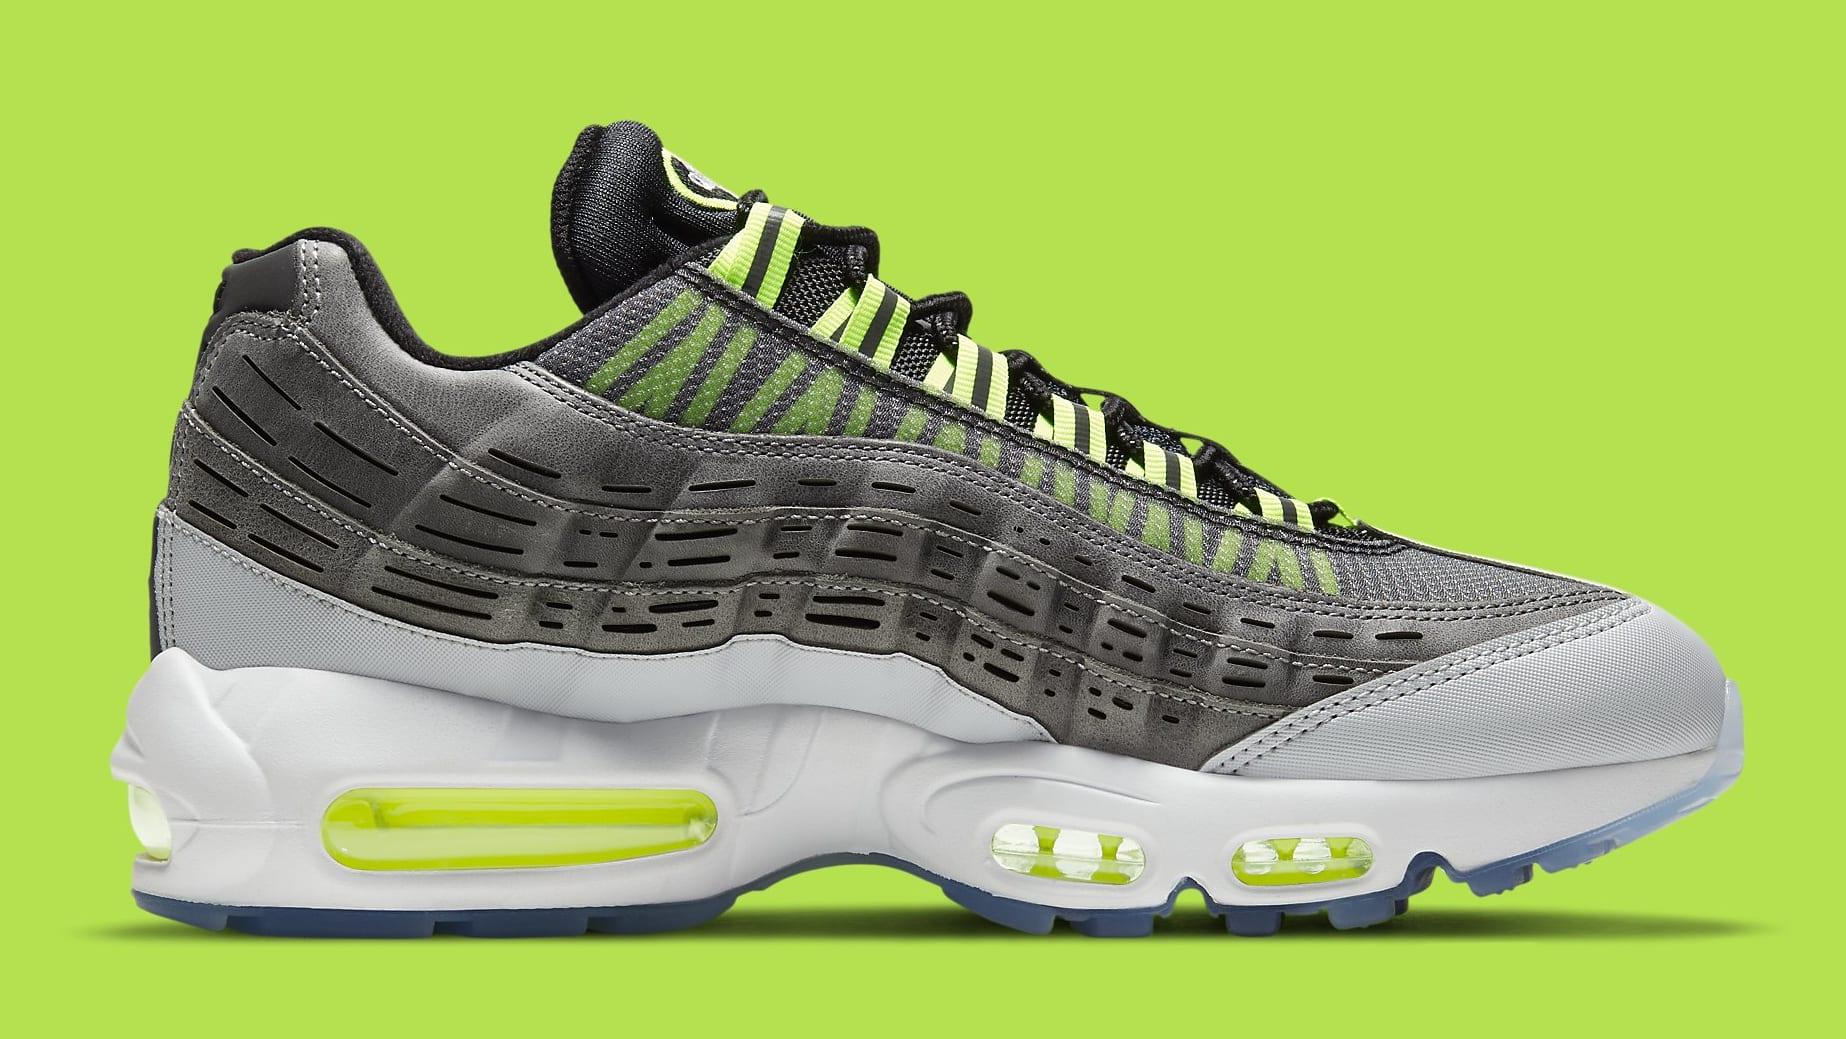 Kim Jones x Nike Air Max 95 Volt Release Date DD1871-002 Medial